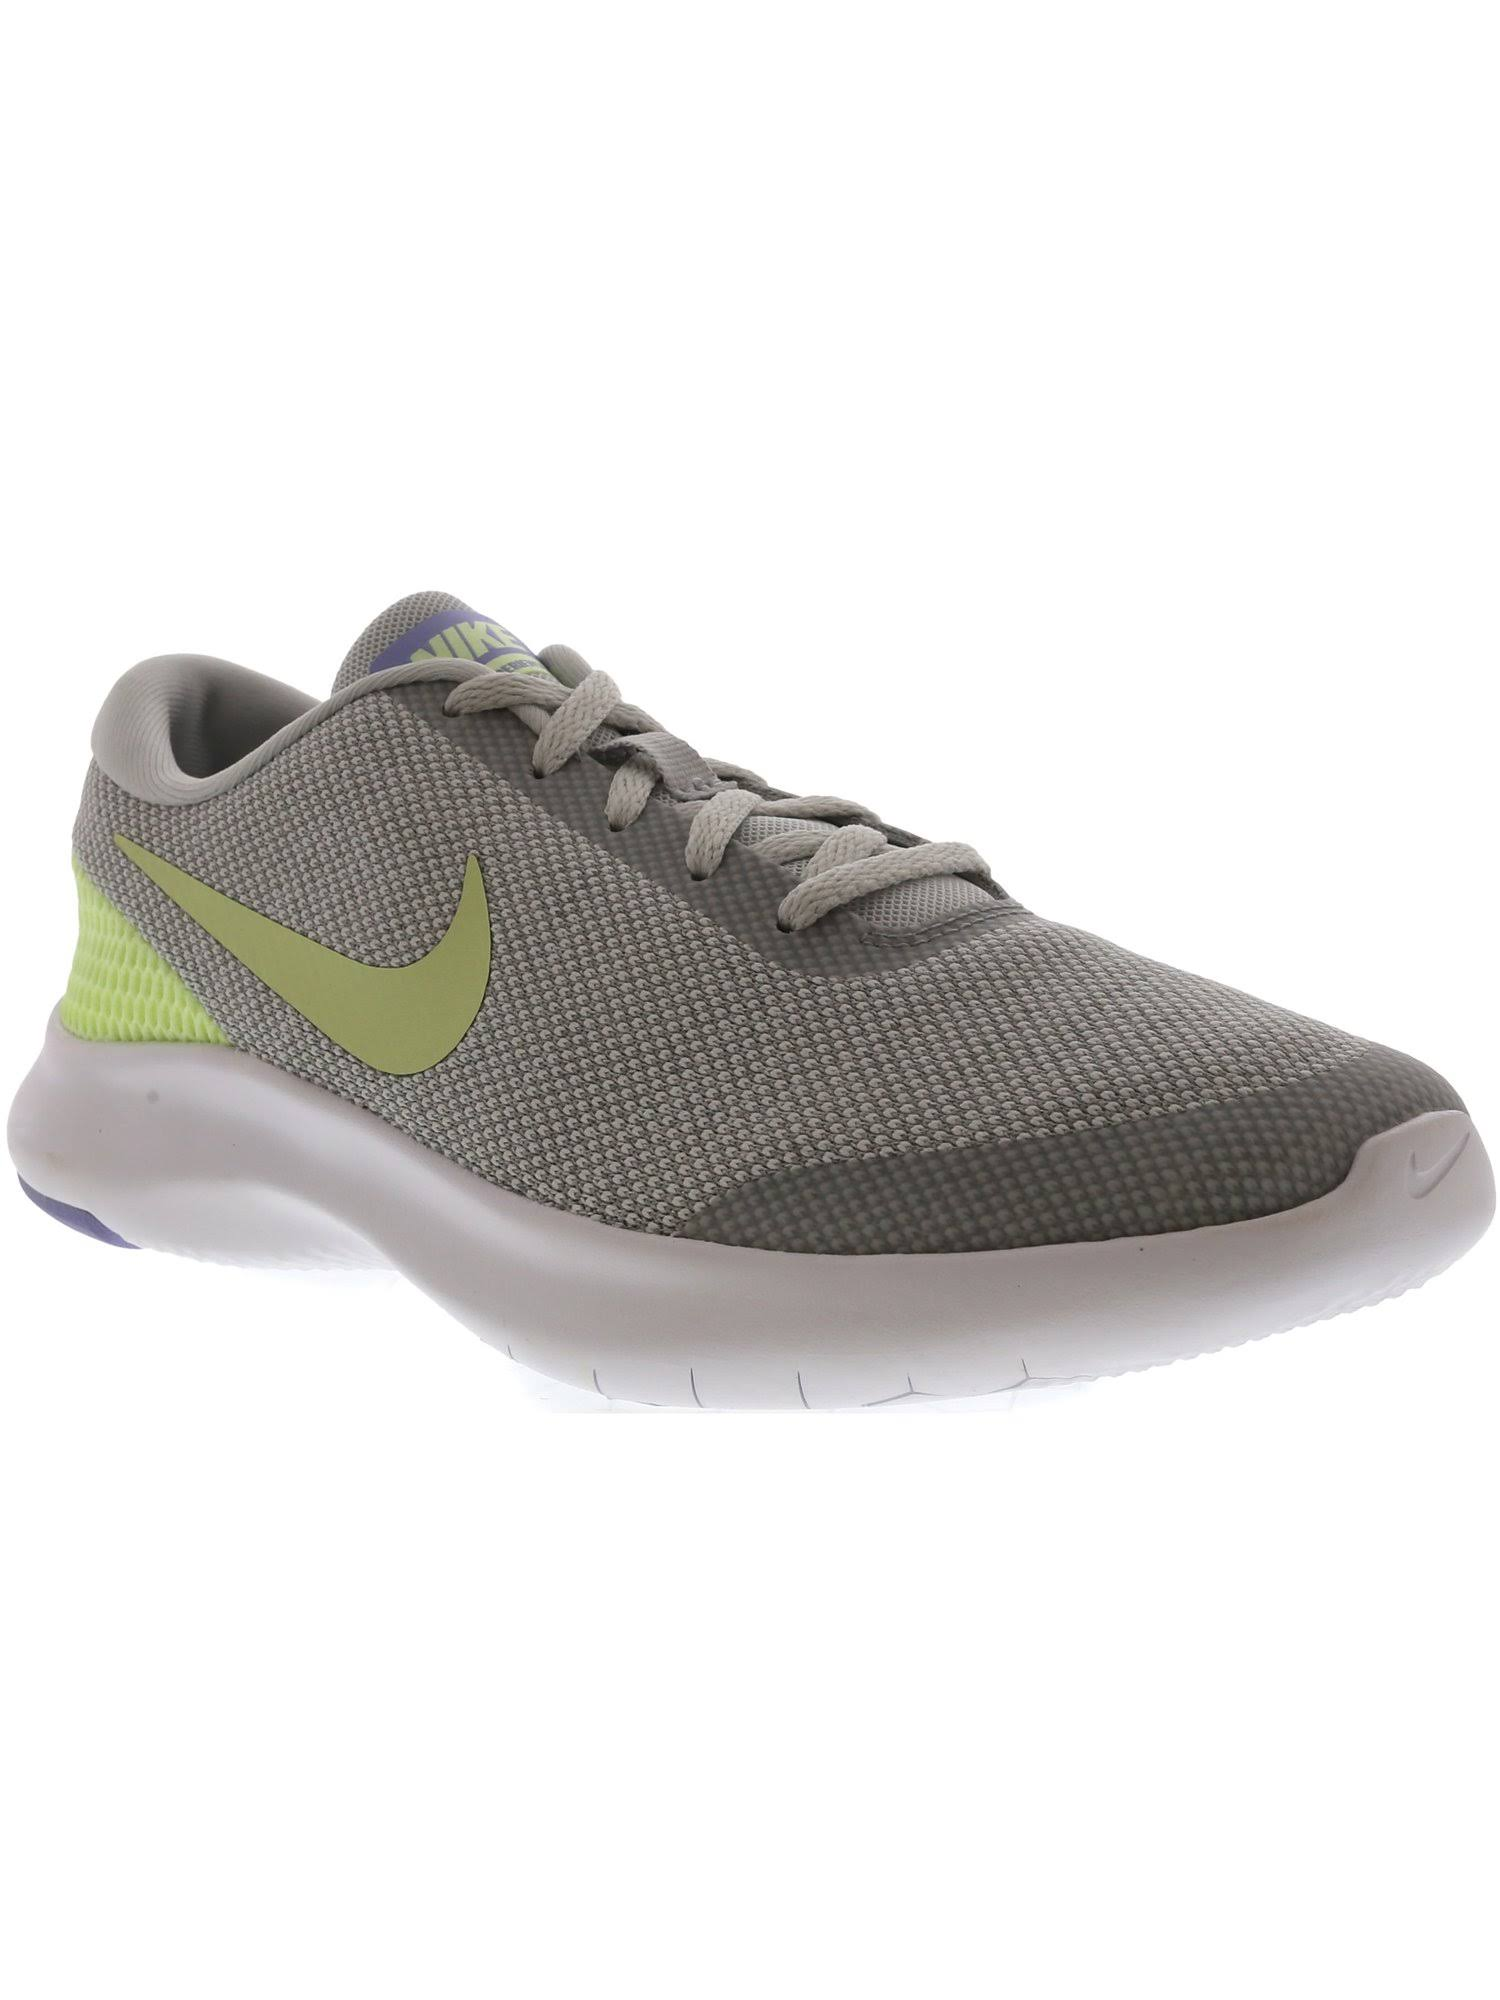 8 De Volt Experience Nike Mujer Tamaño Running 7 Zapatillas Flex Barely Para Rn Platinum Pure Oxford RwTqUq